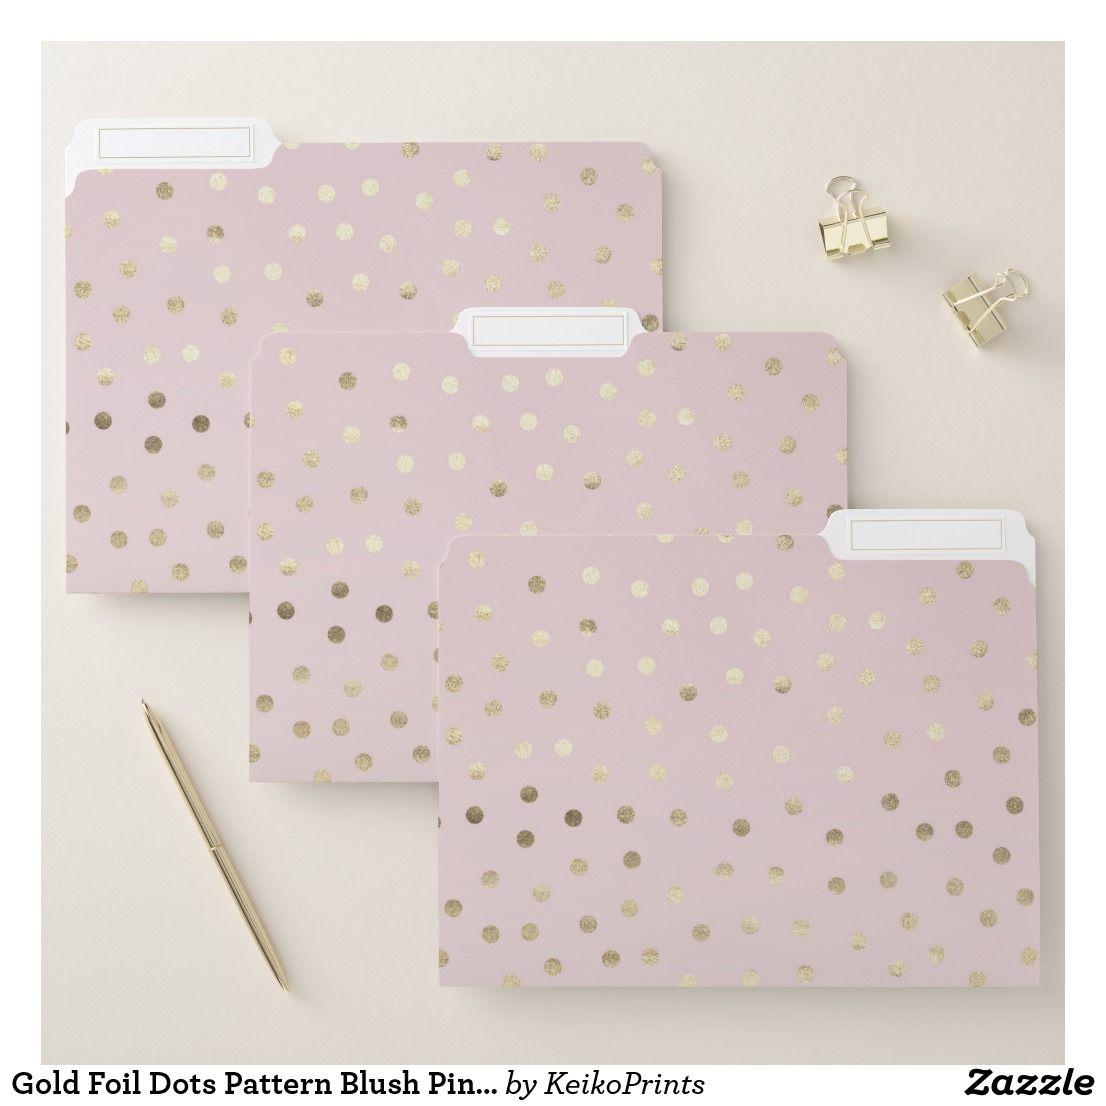 Gold Foil Dots Pattern Blush Pink File Folders